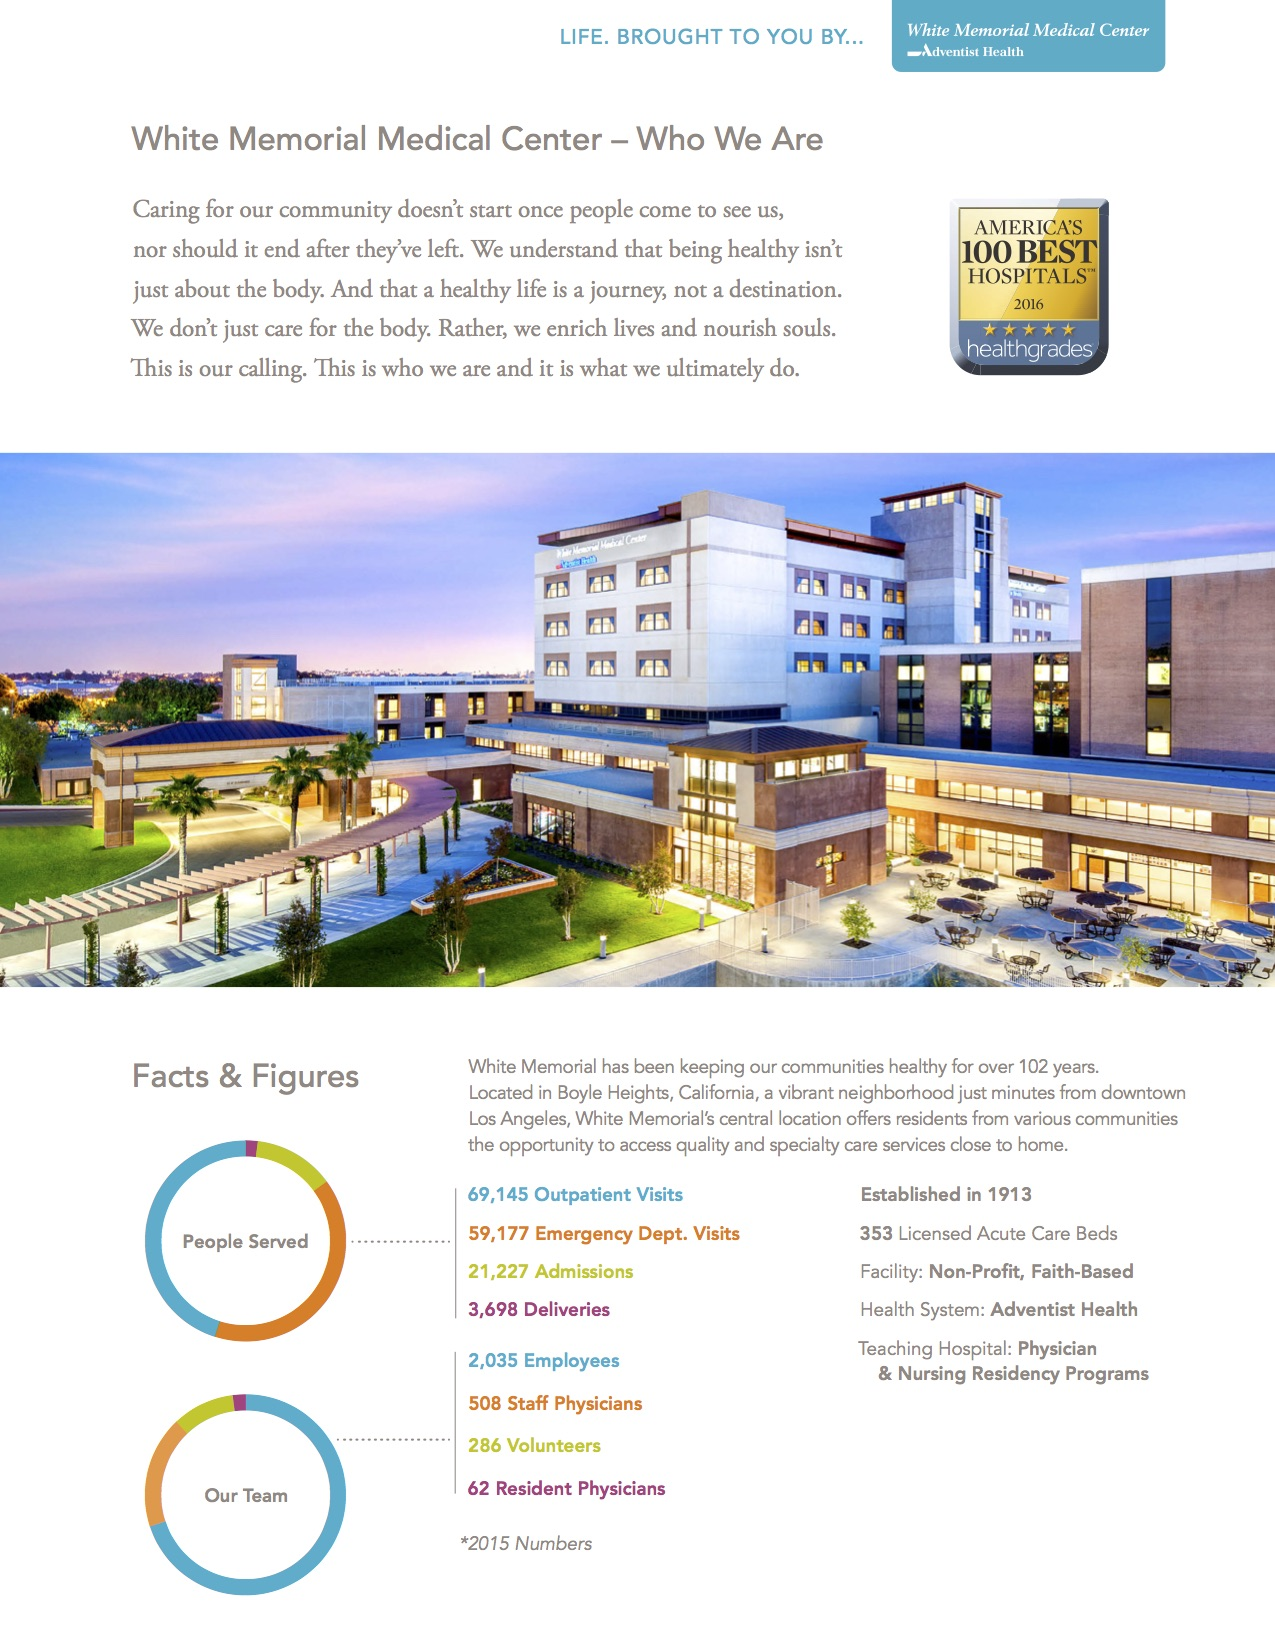 fact-sheet-wmmc-2015